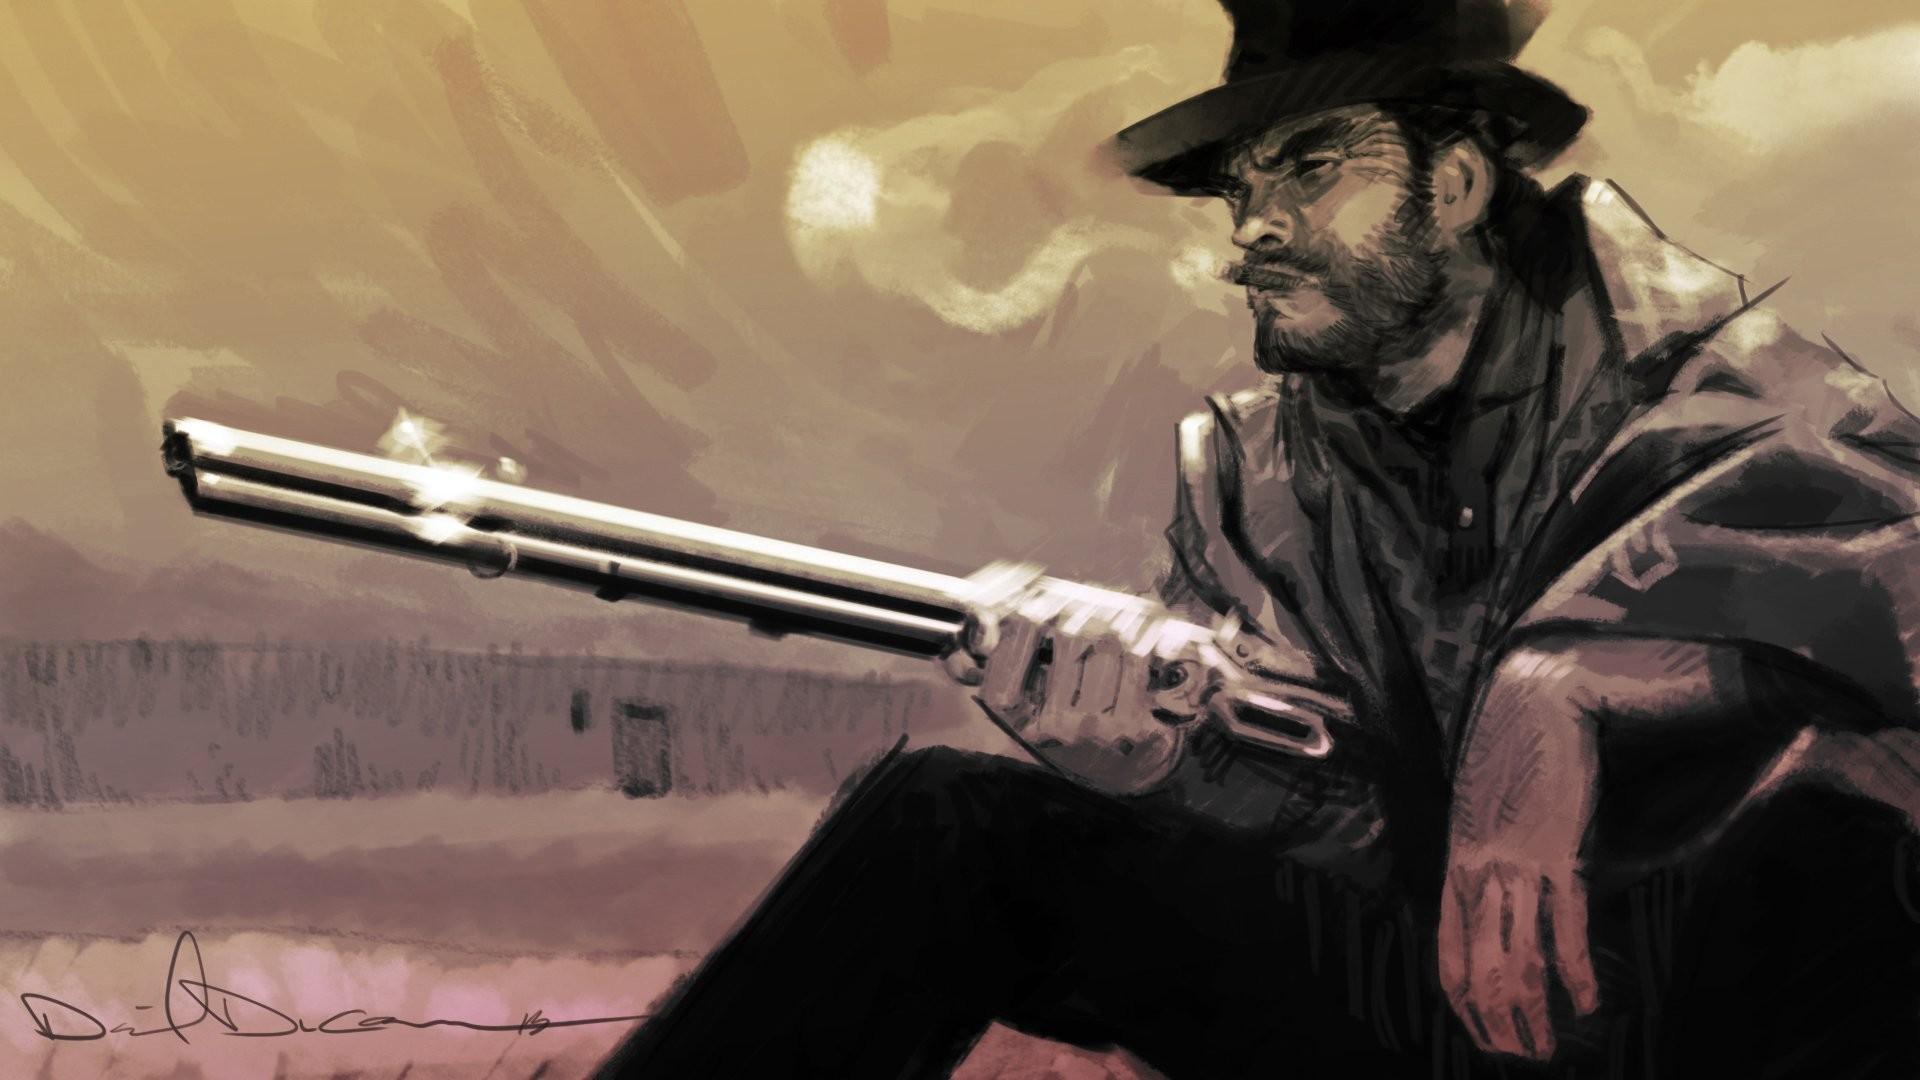 Cowboy Bebop Quote Wallpaper Wild West Wallpapers 64 Images